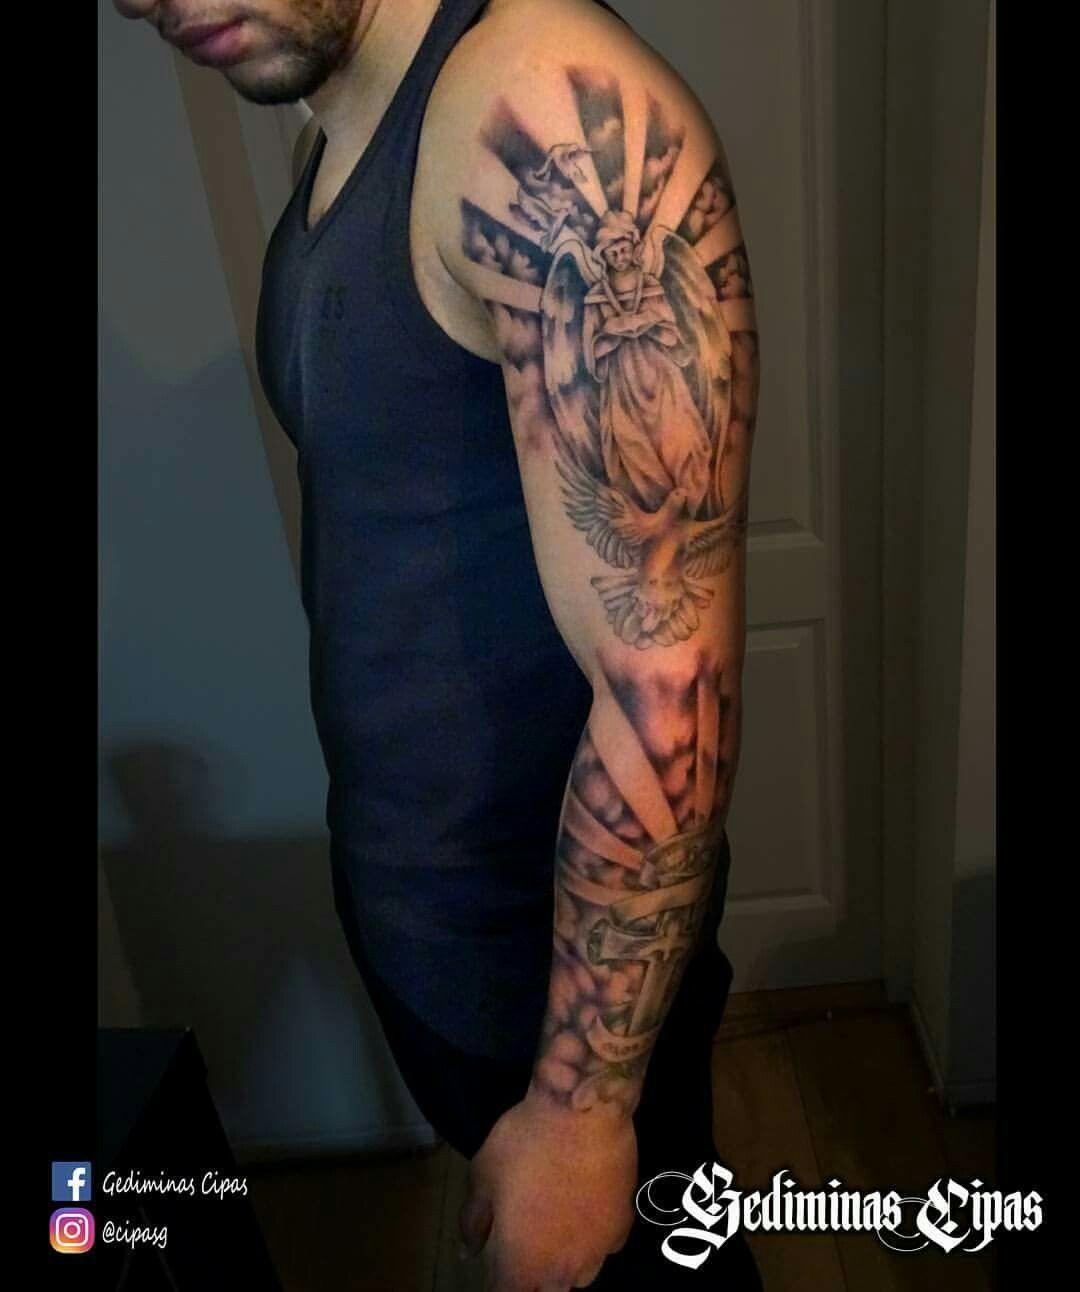 tattoo design tattoo sketch religiouse tattoo angel tattoo arm sleve tattoo art tattoo. Black Bedroom Furniture Sets. Home Design Ideas